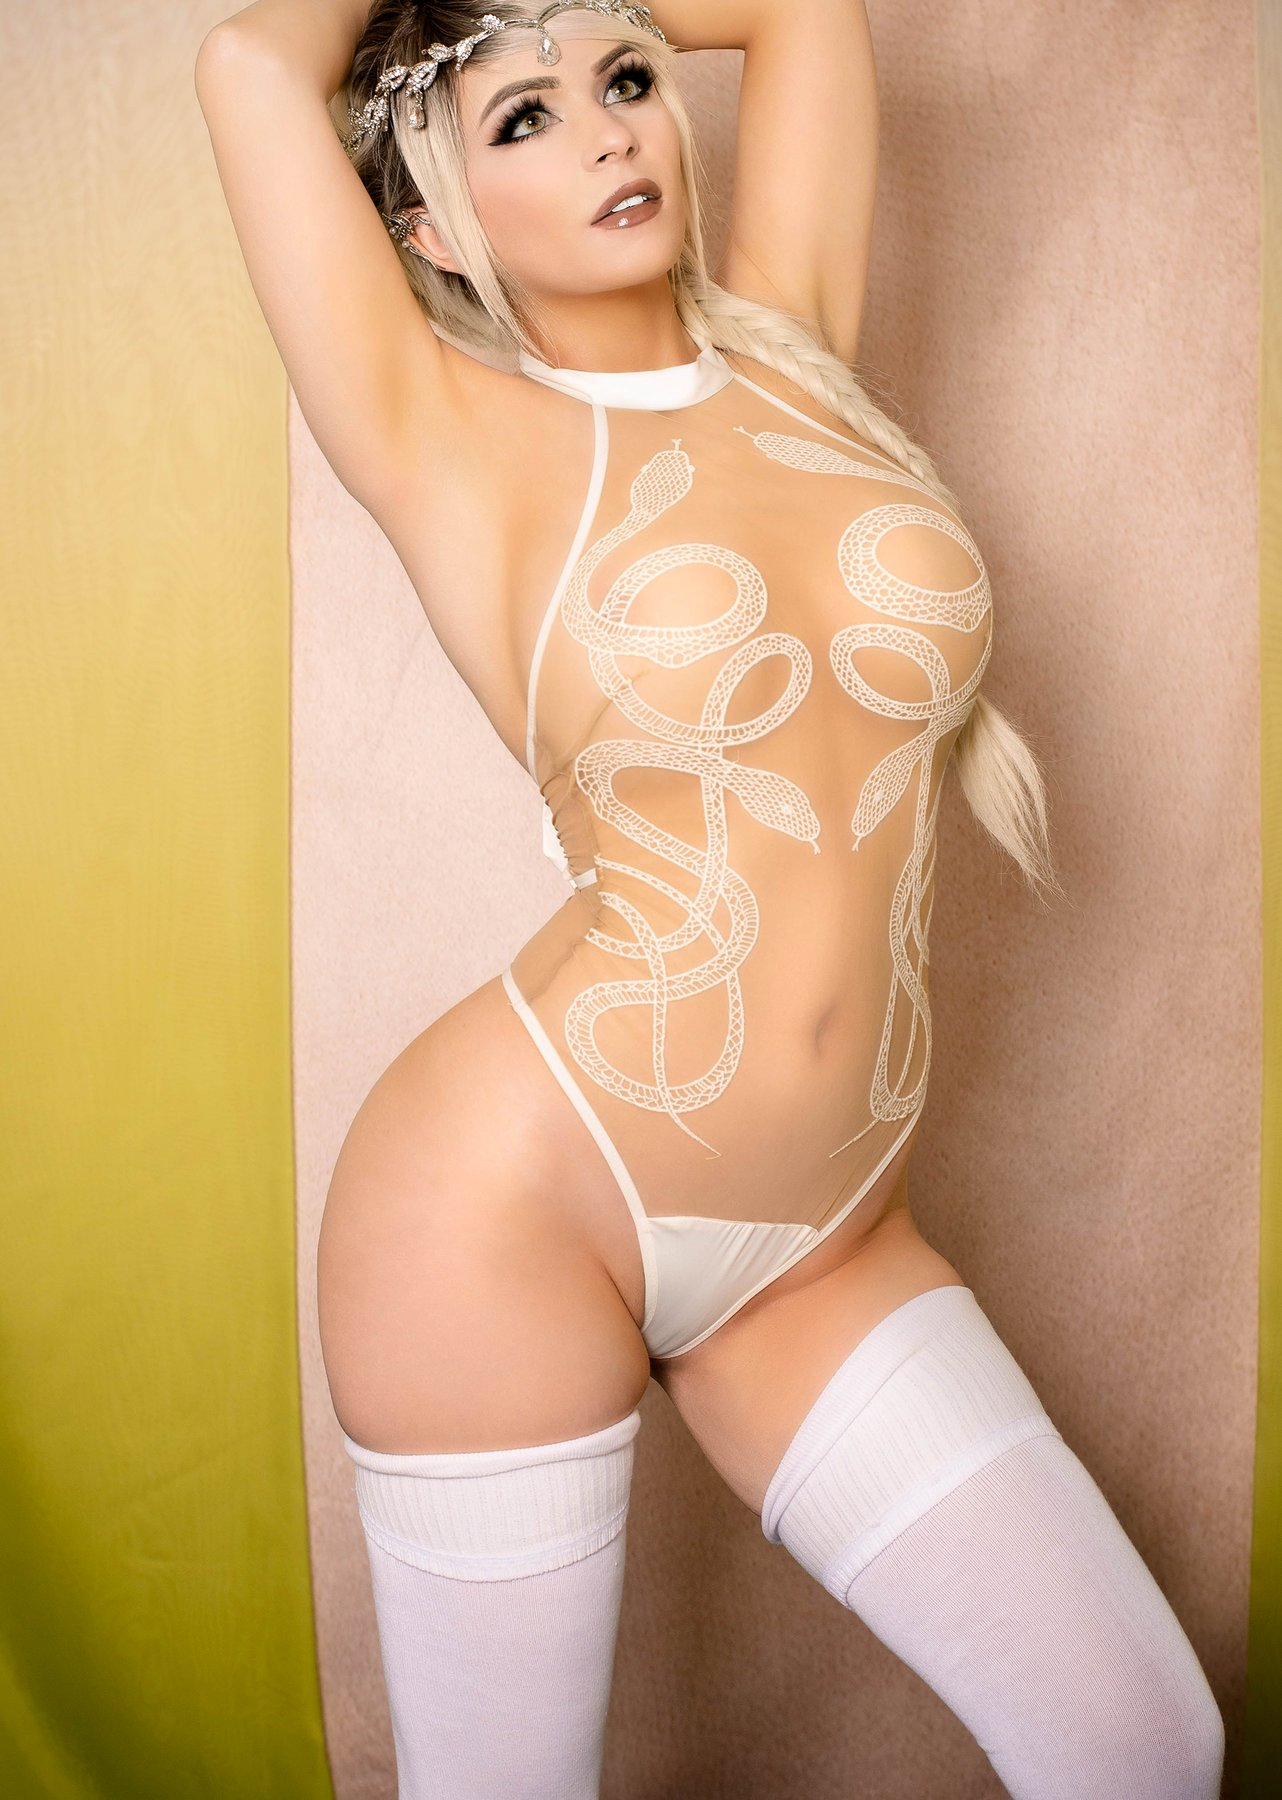 Danielle Beaulieu Daniellecosplay Onlyfans Nude Leaks 0018